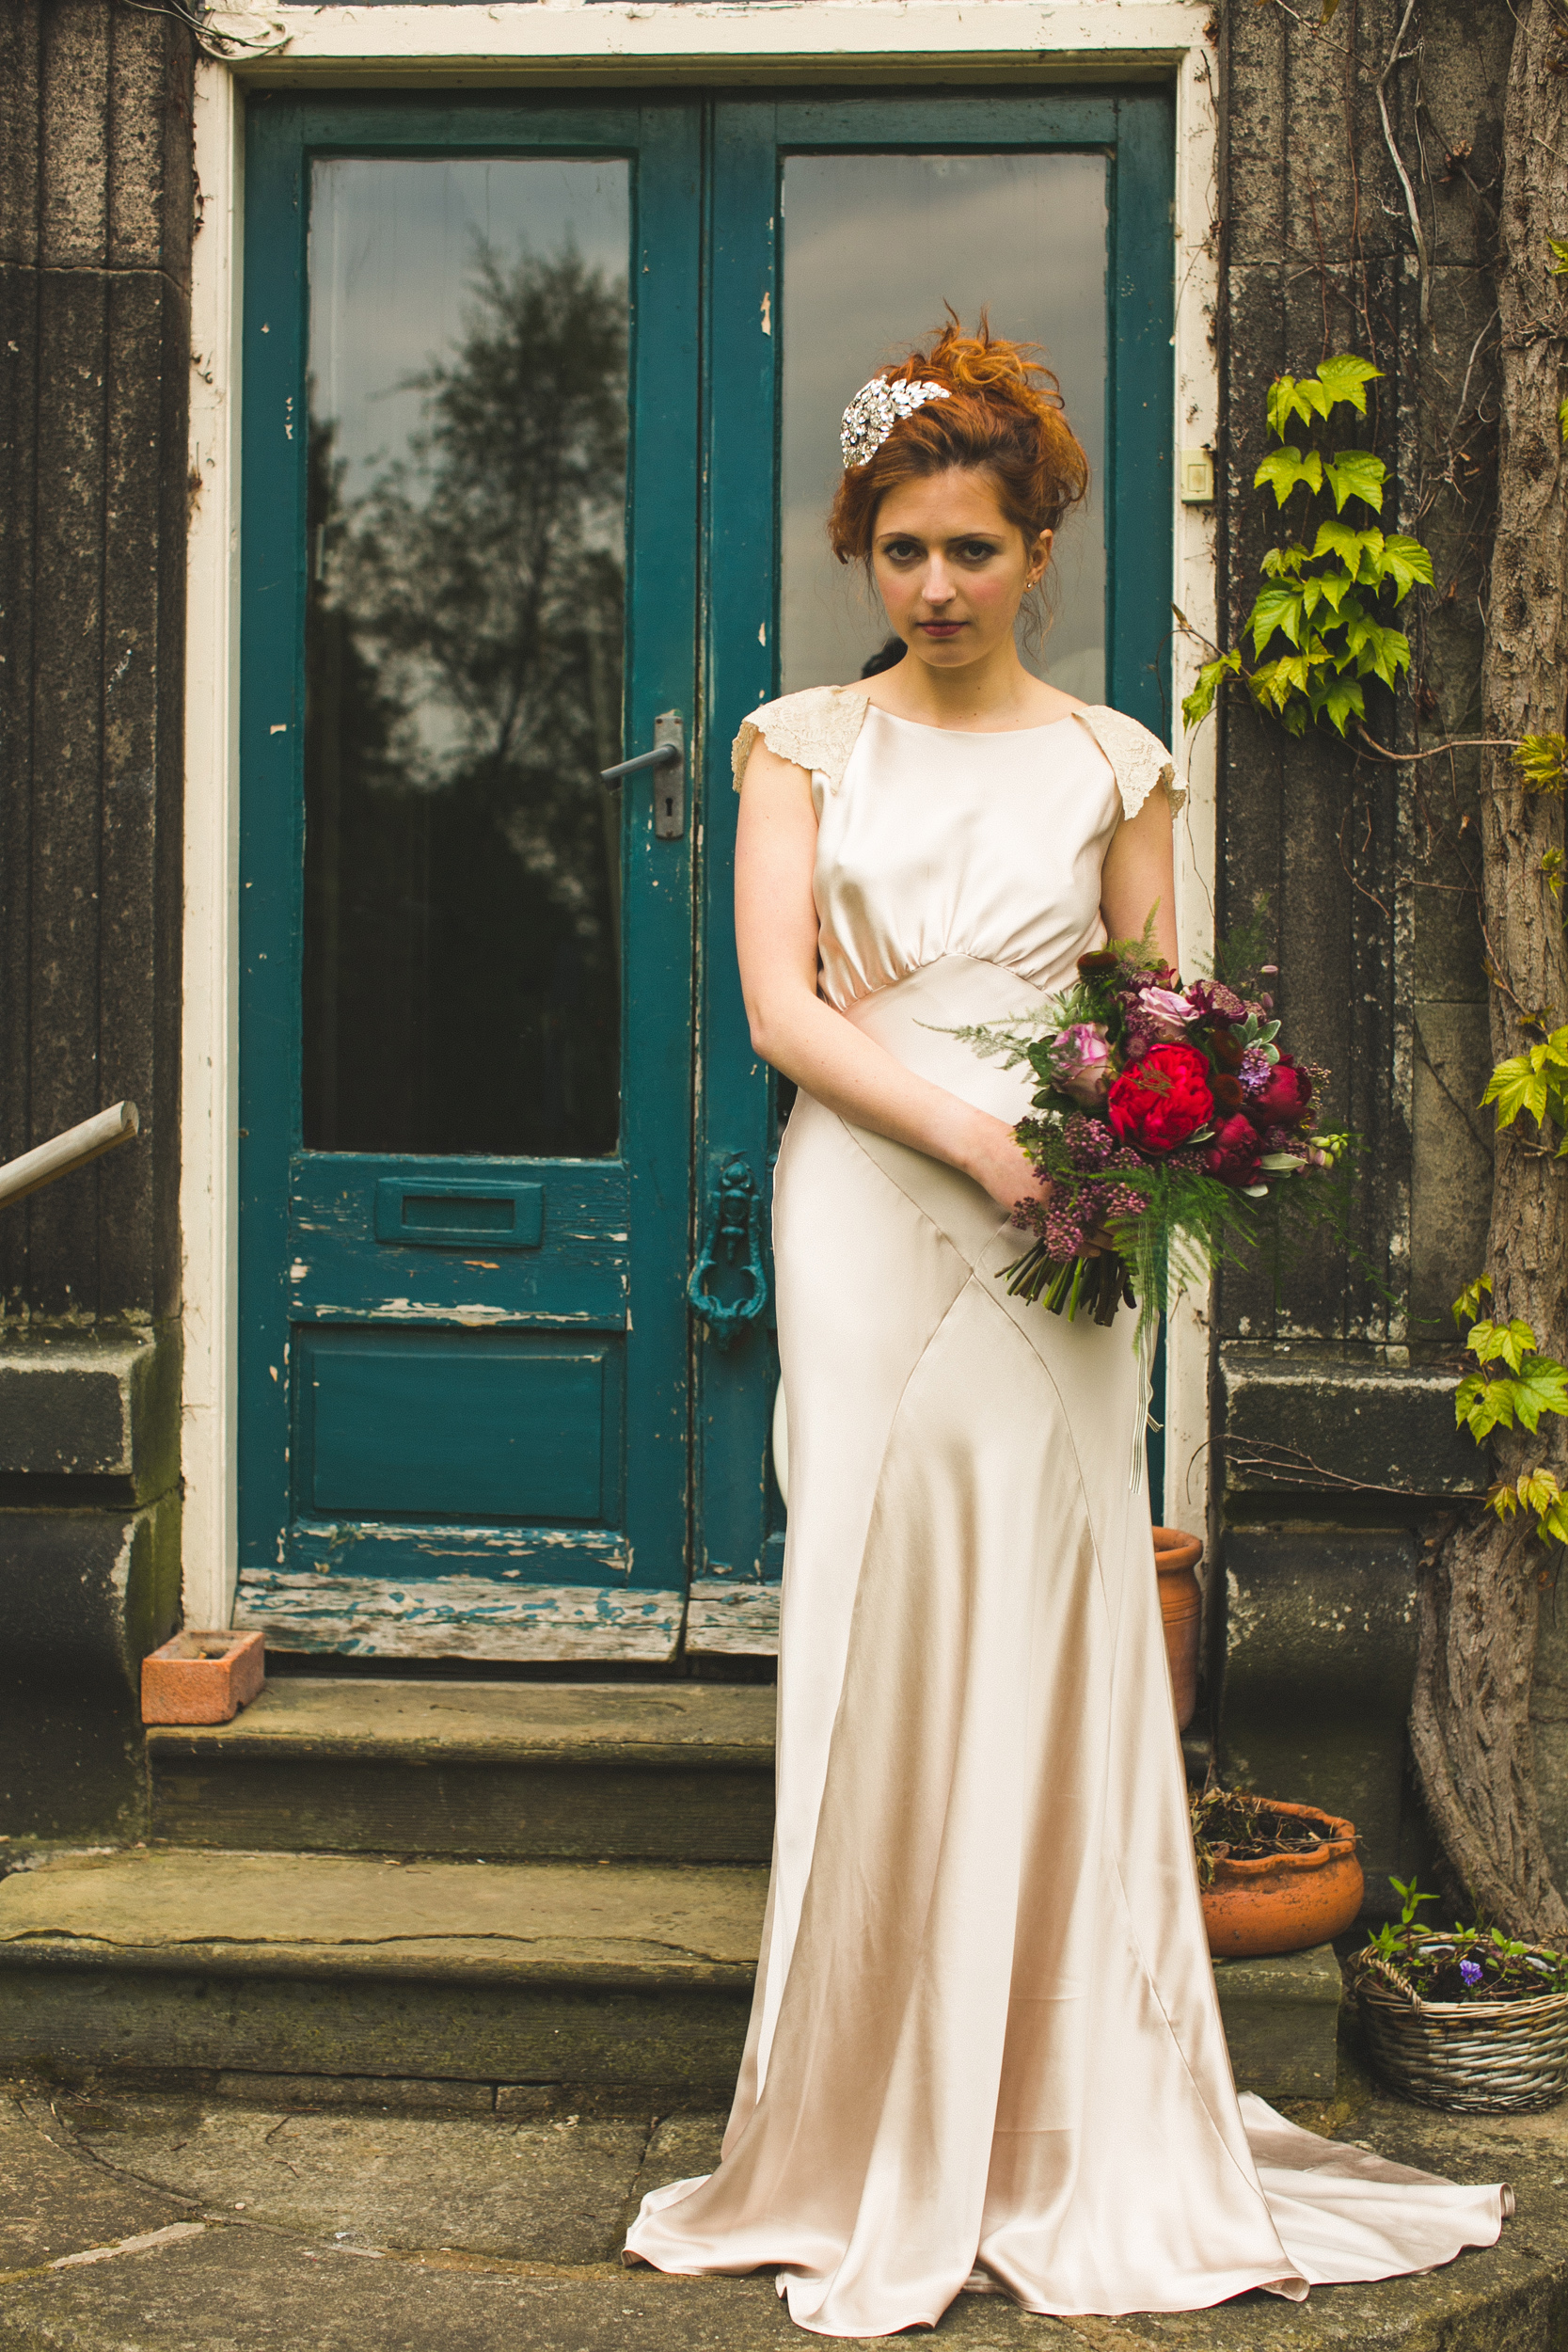 kate-beaumont-vintage-inspired-bridal-wedding-dresses-Sheffield-S6-26.jpg